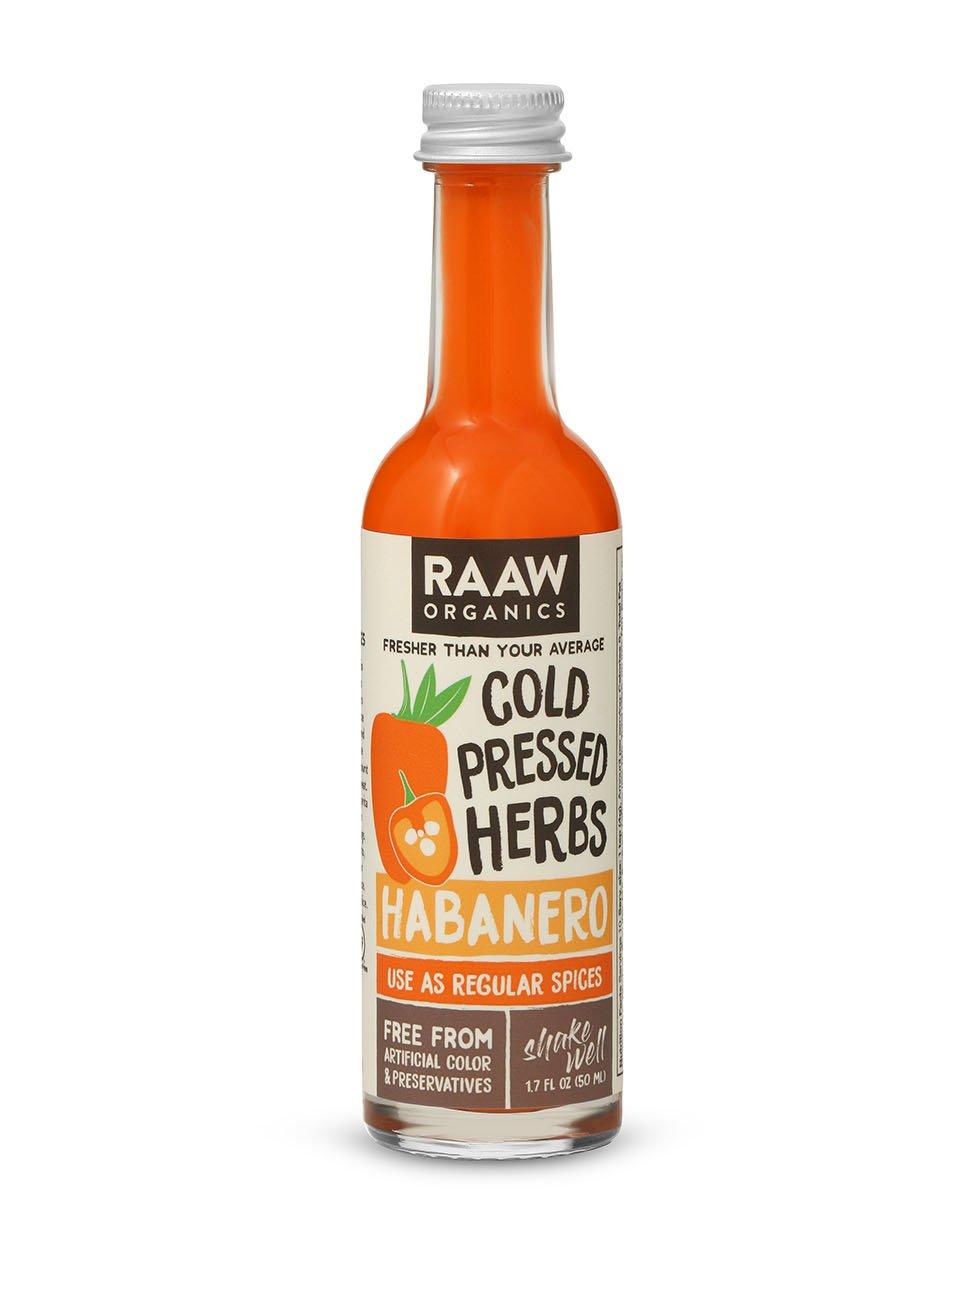 Raaw Organics